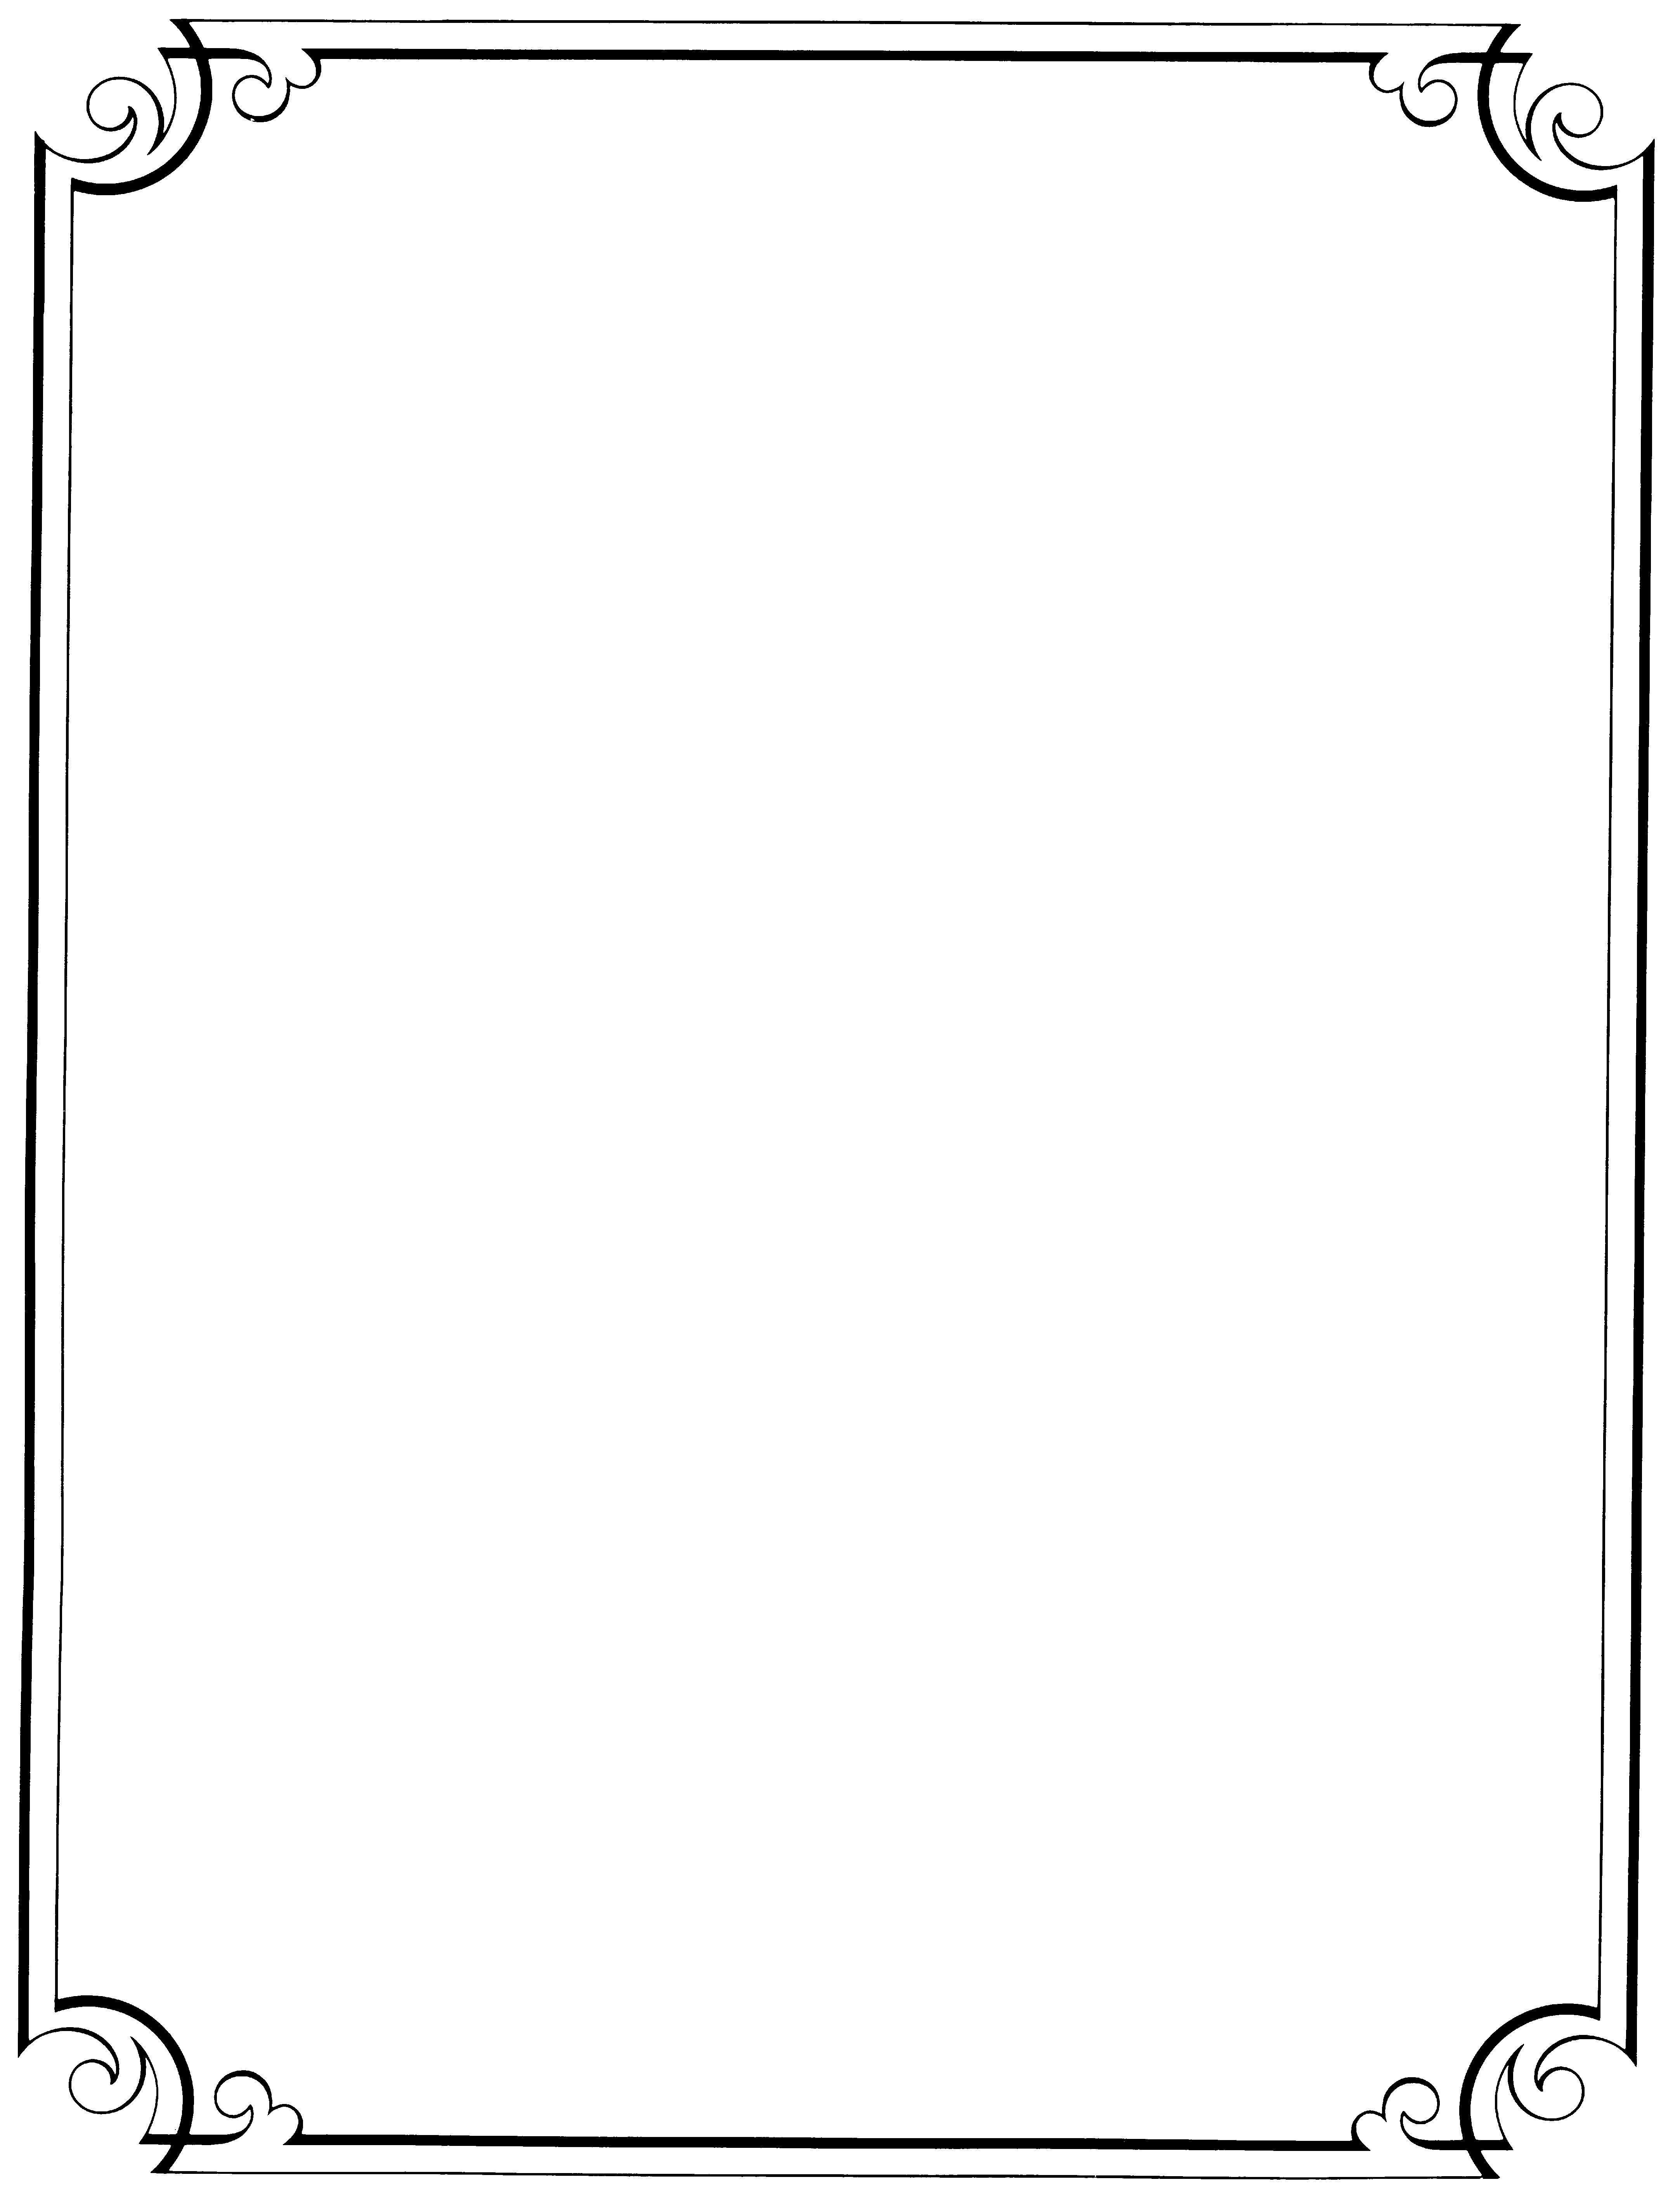 elegant page border designs